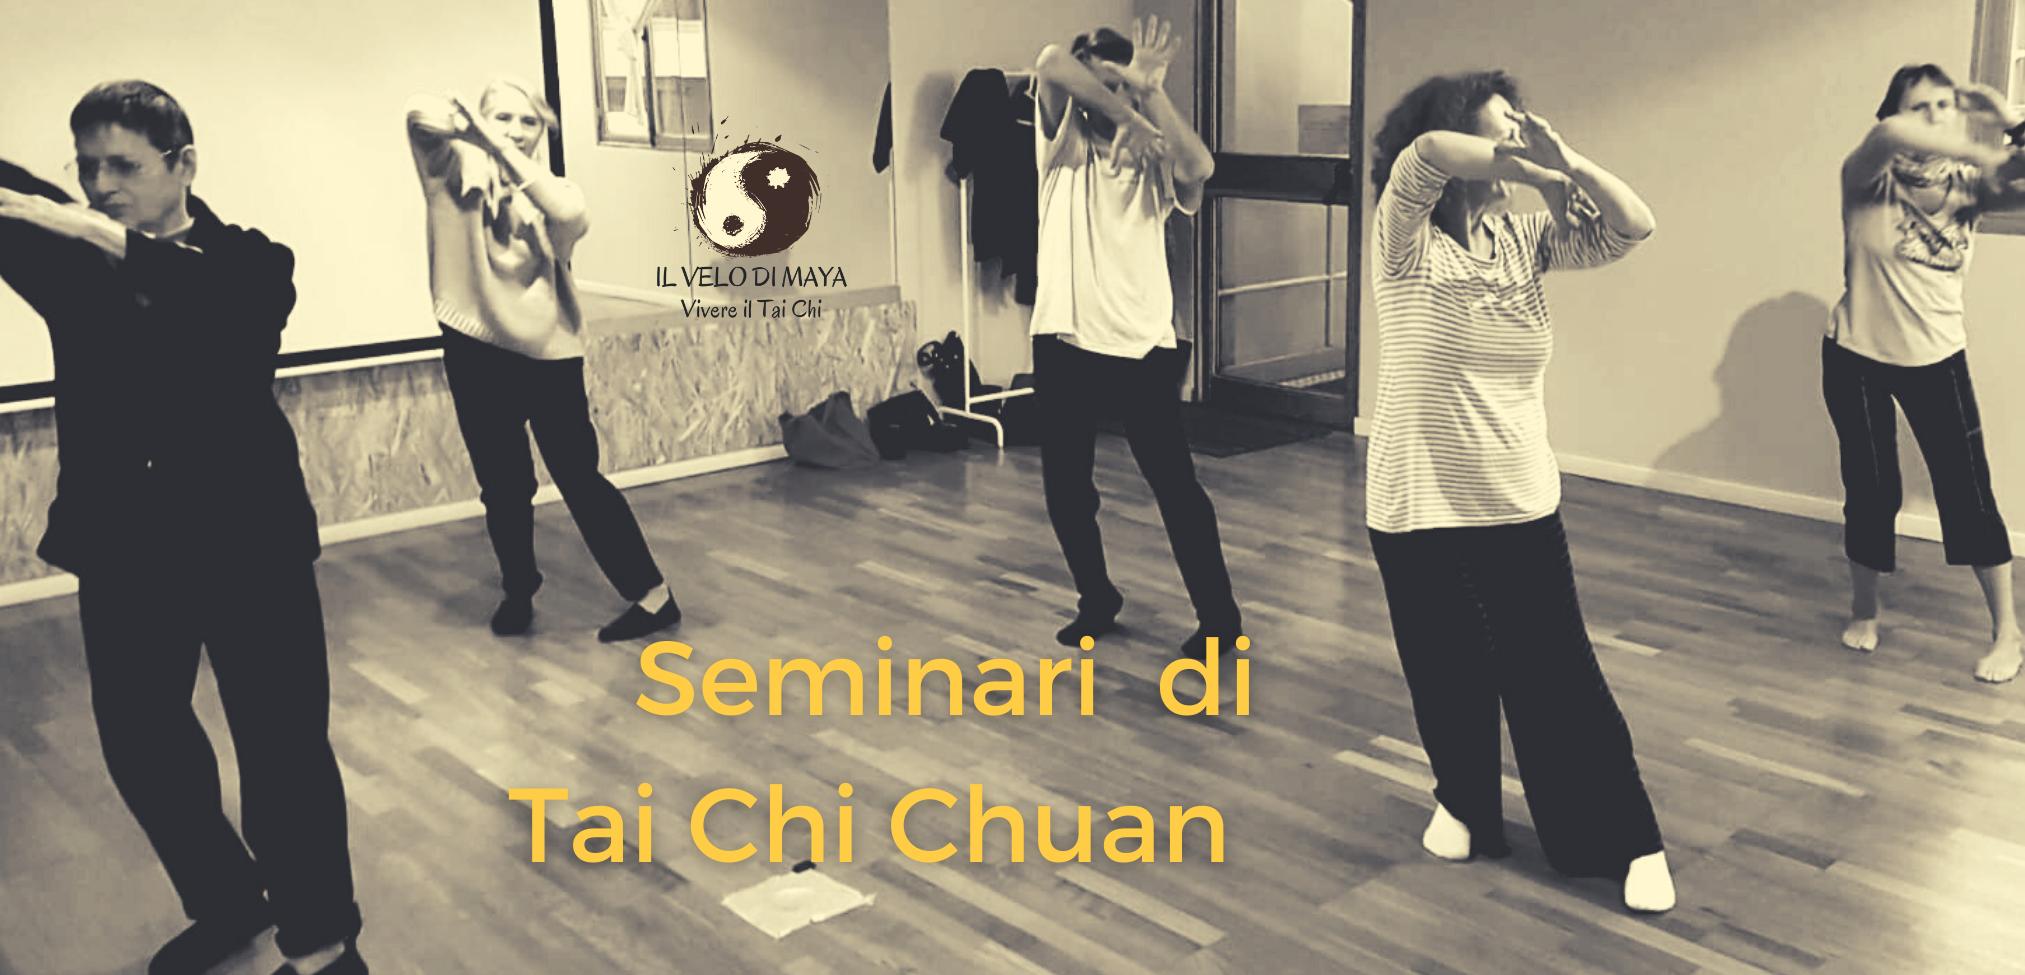 Tai Chi Chuan seminari